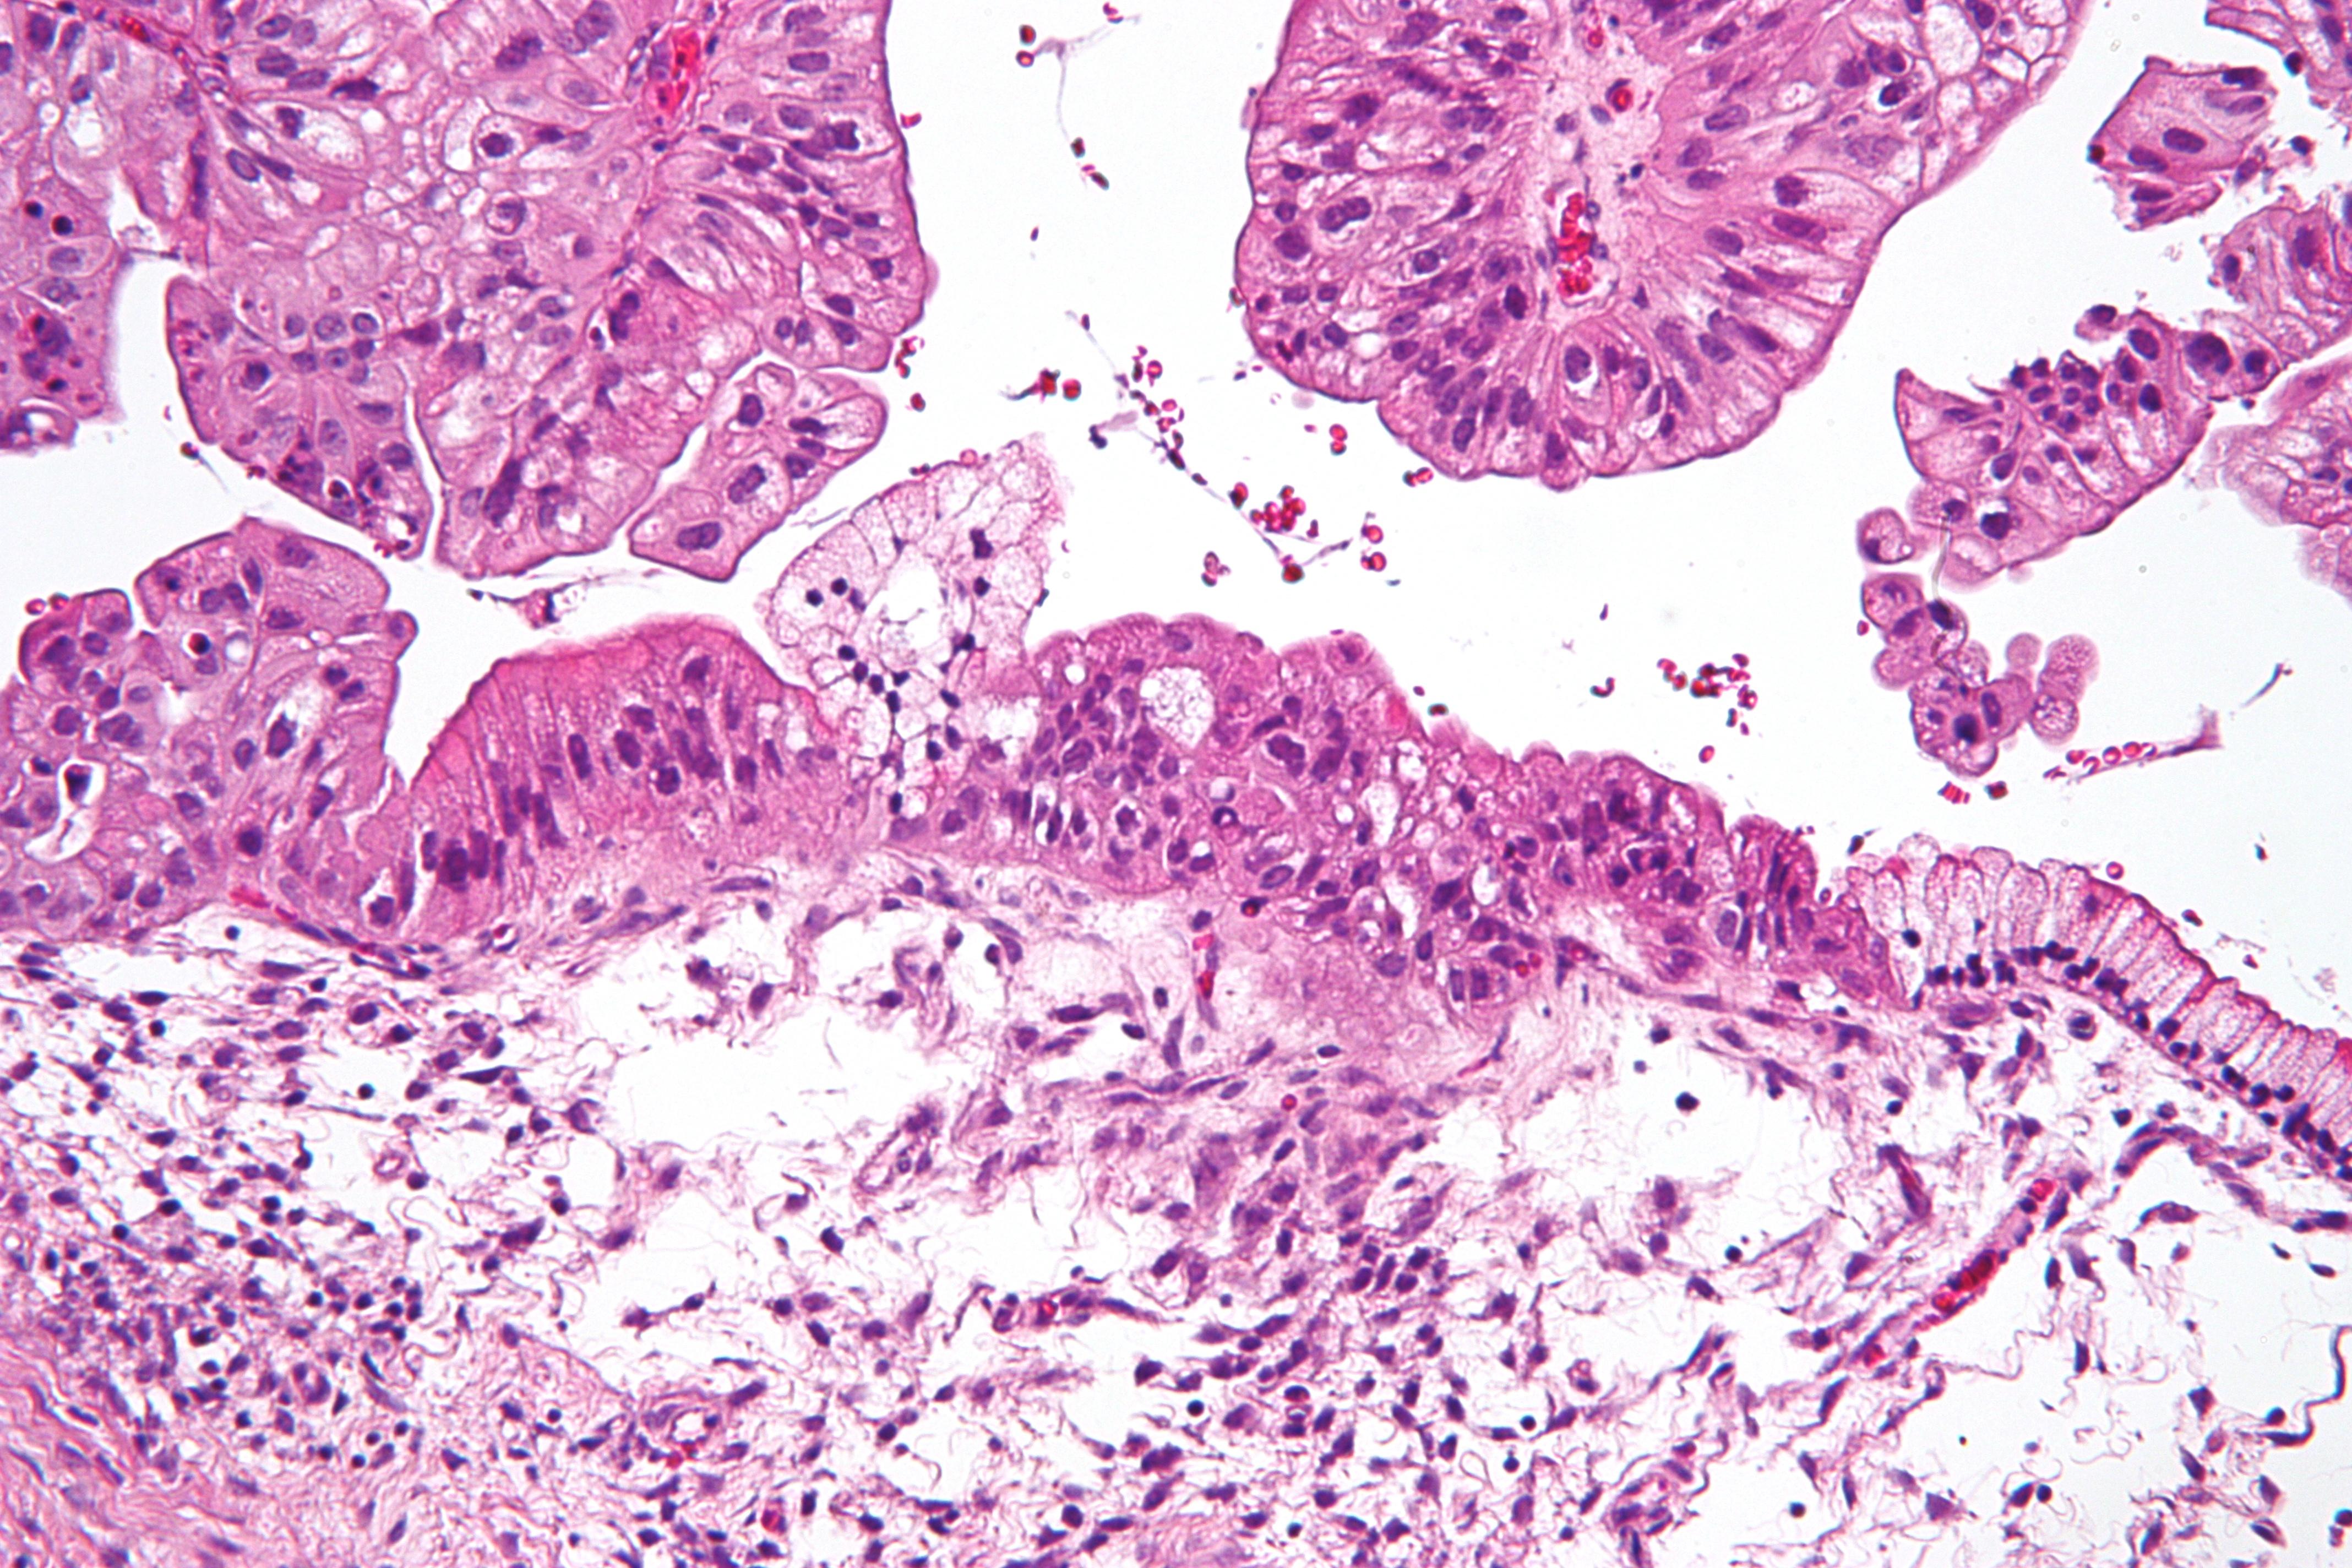 Endometrial cancer histology